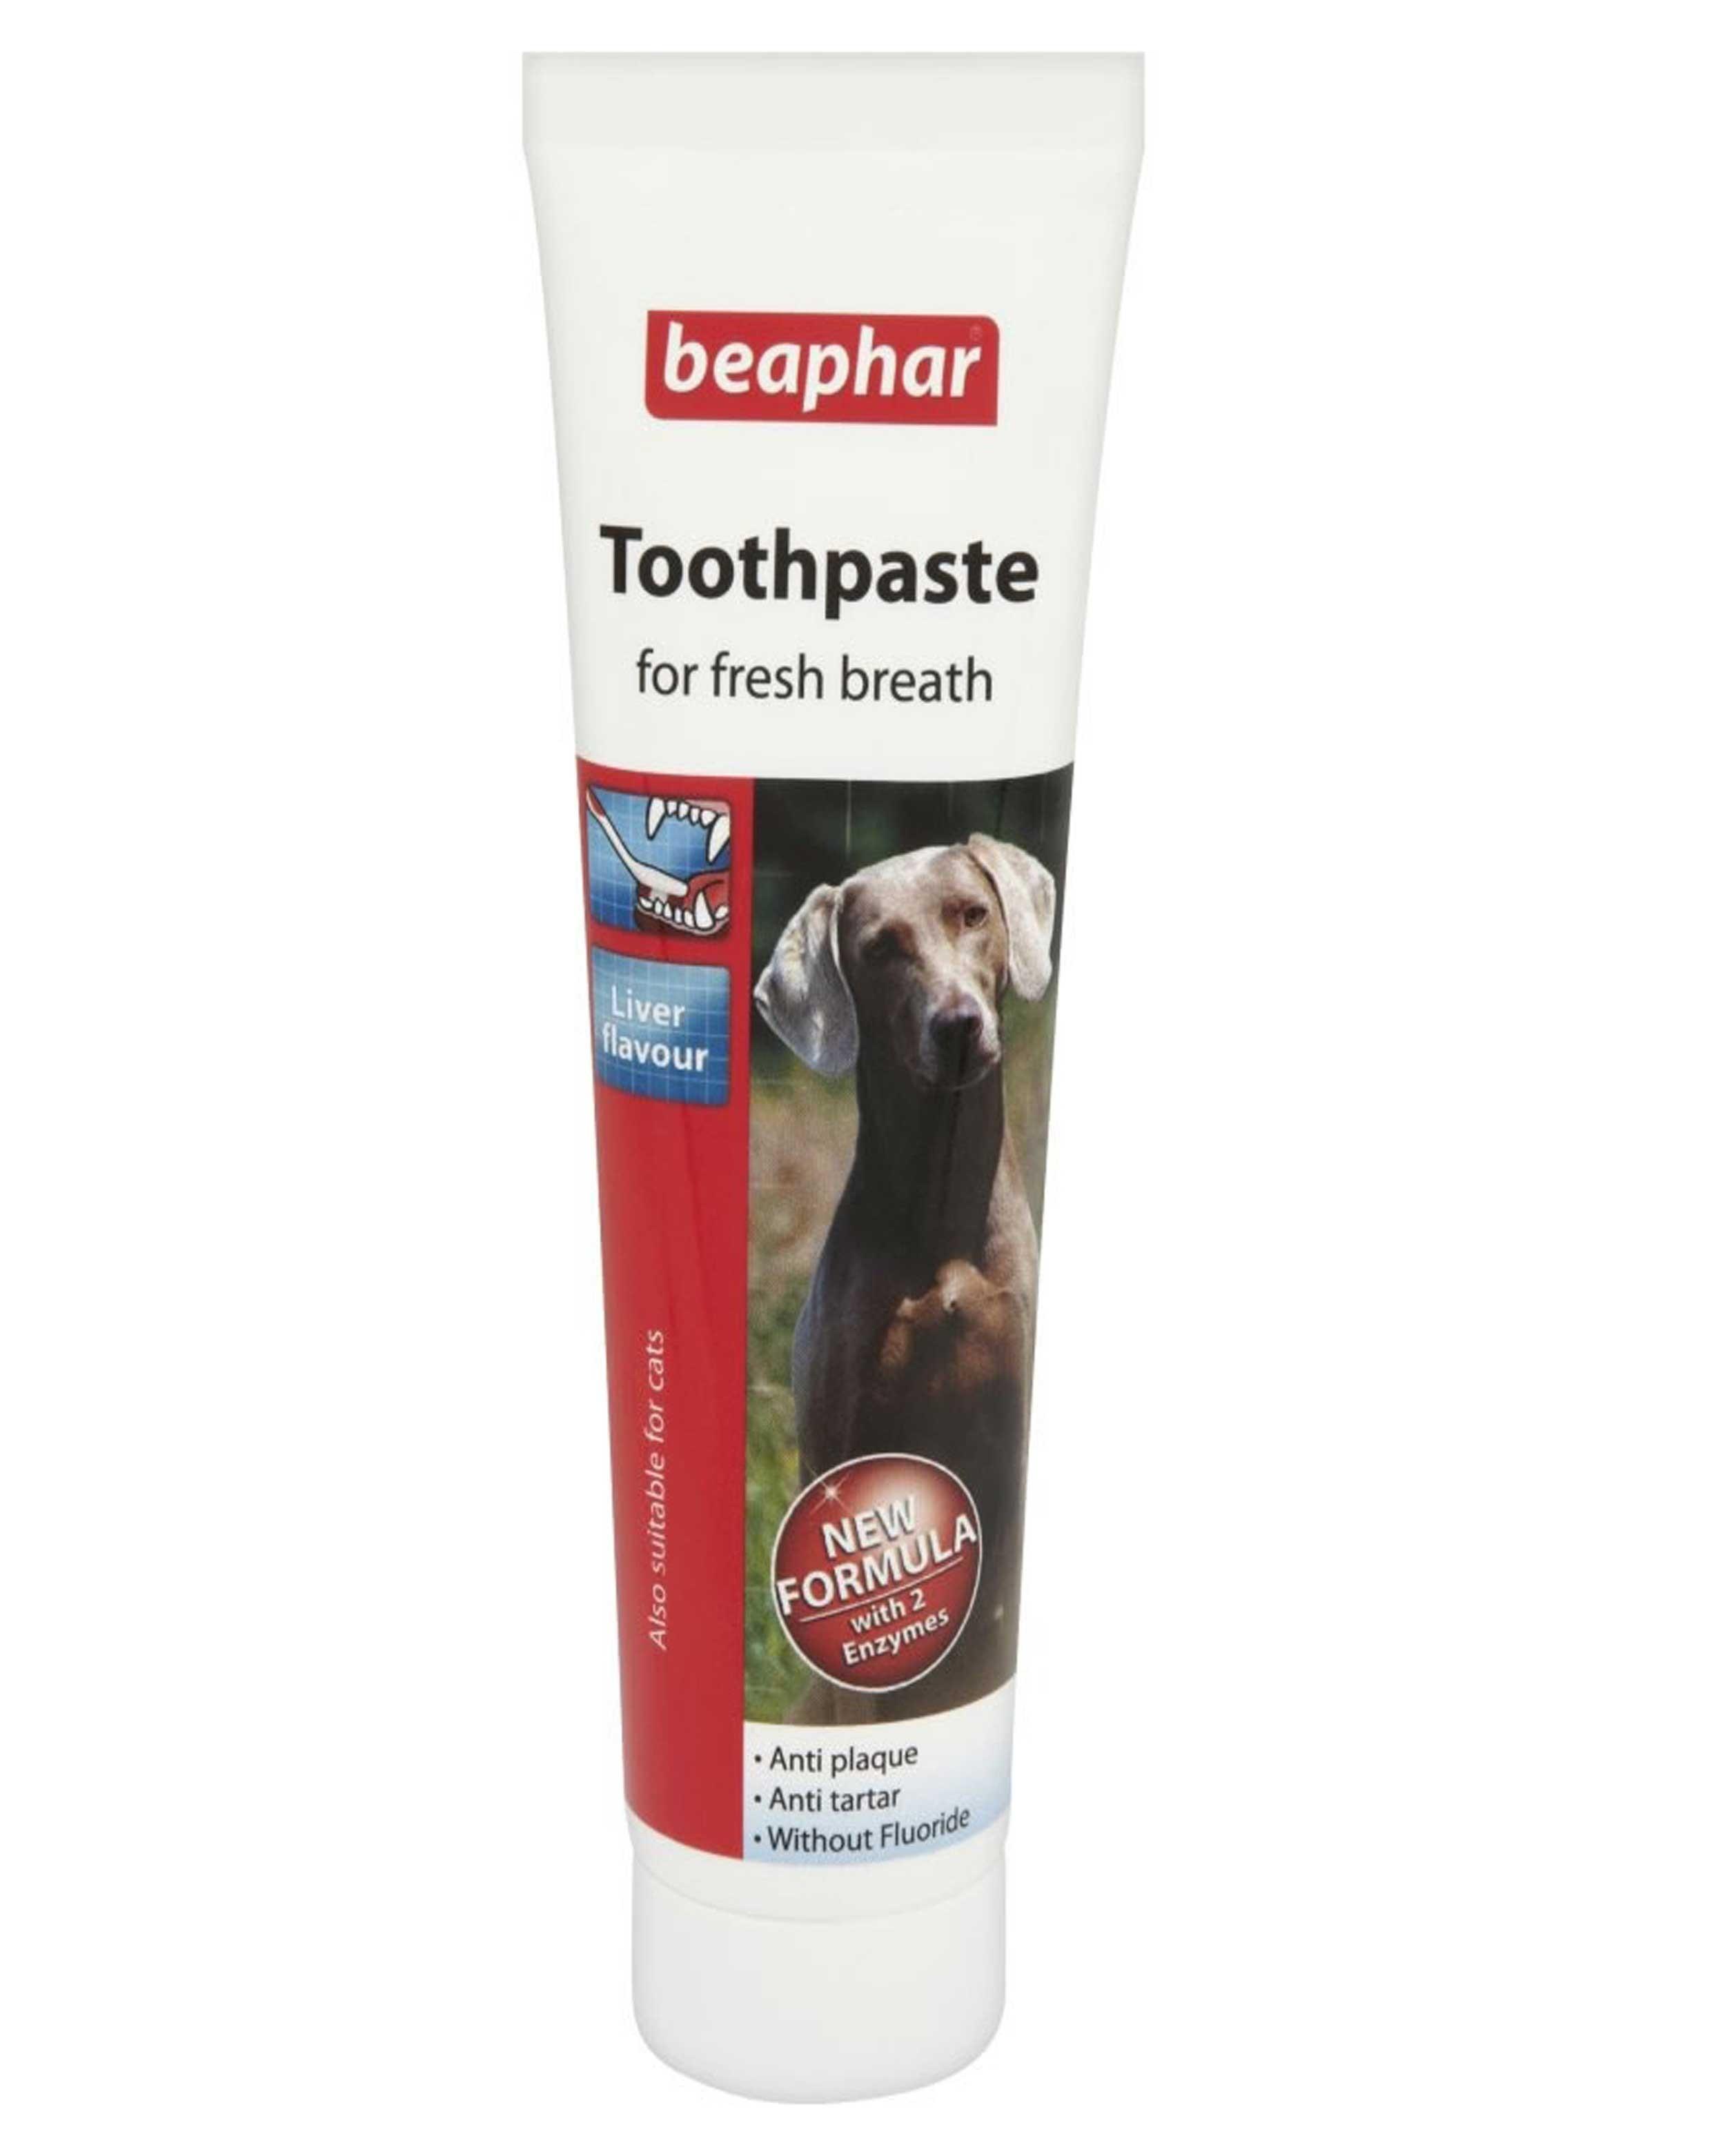 Beaphar Toothpaste รสตับ Exp.08/18